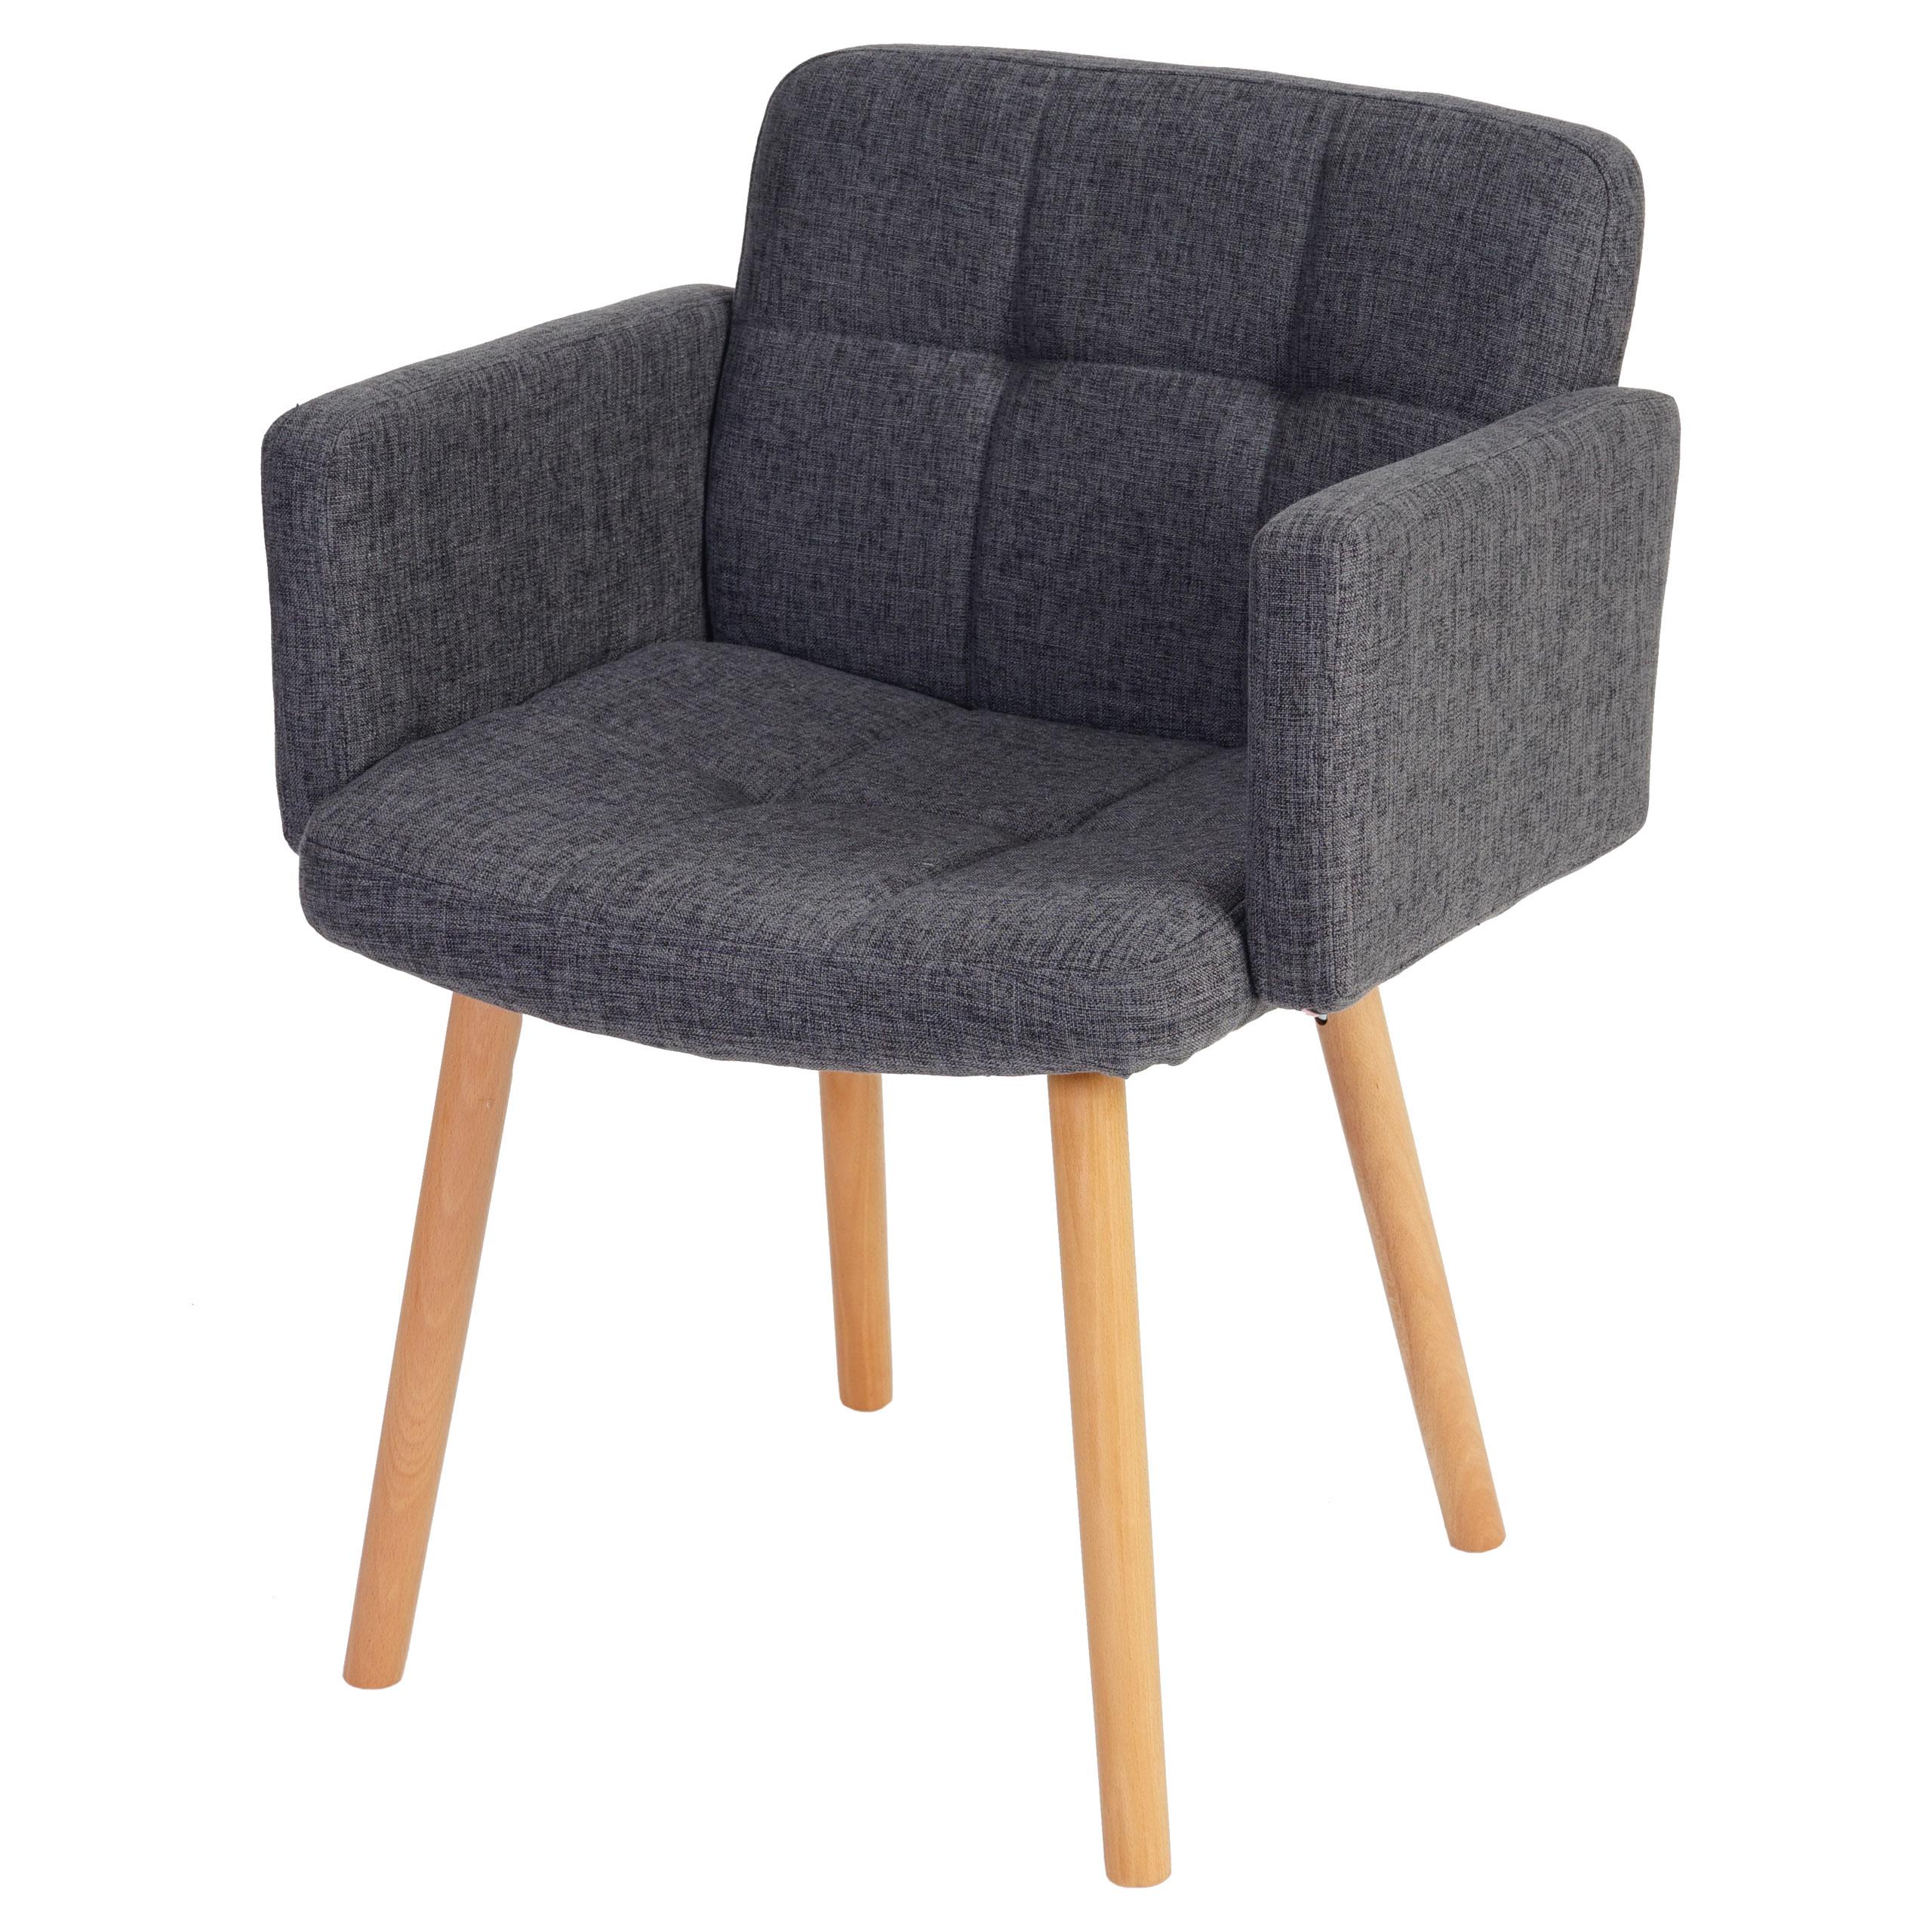 esszimmerstuhl orlando ii stuhl lehnstuhl retro design. Black Bedroom Furniture Sets. Home Design Ideas